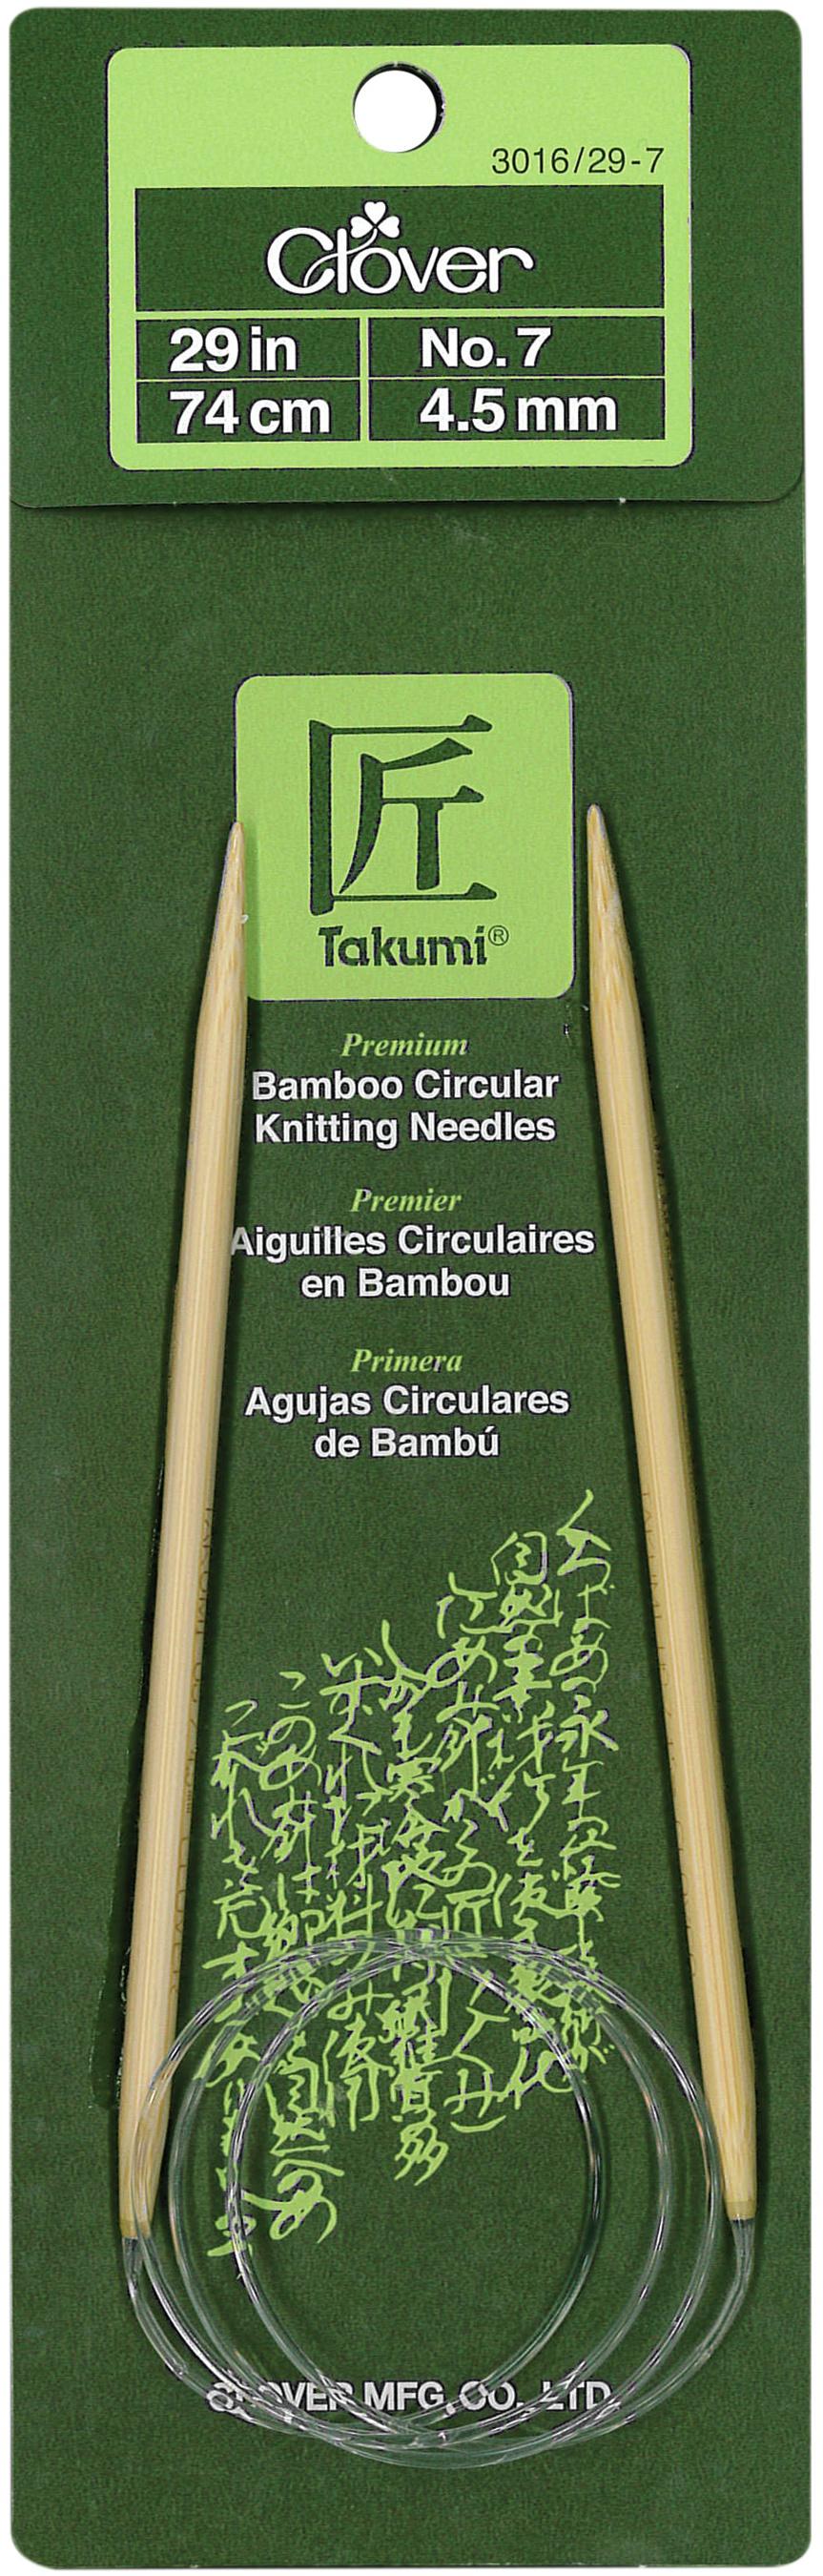 Takumi Bamboo Circular Knitting Needles 29-Size 7/4.5mm